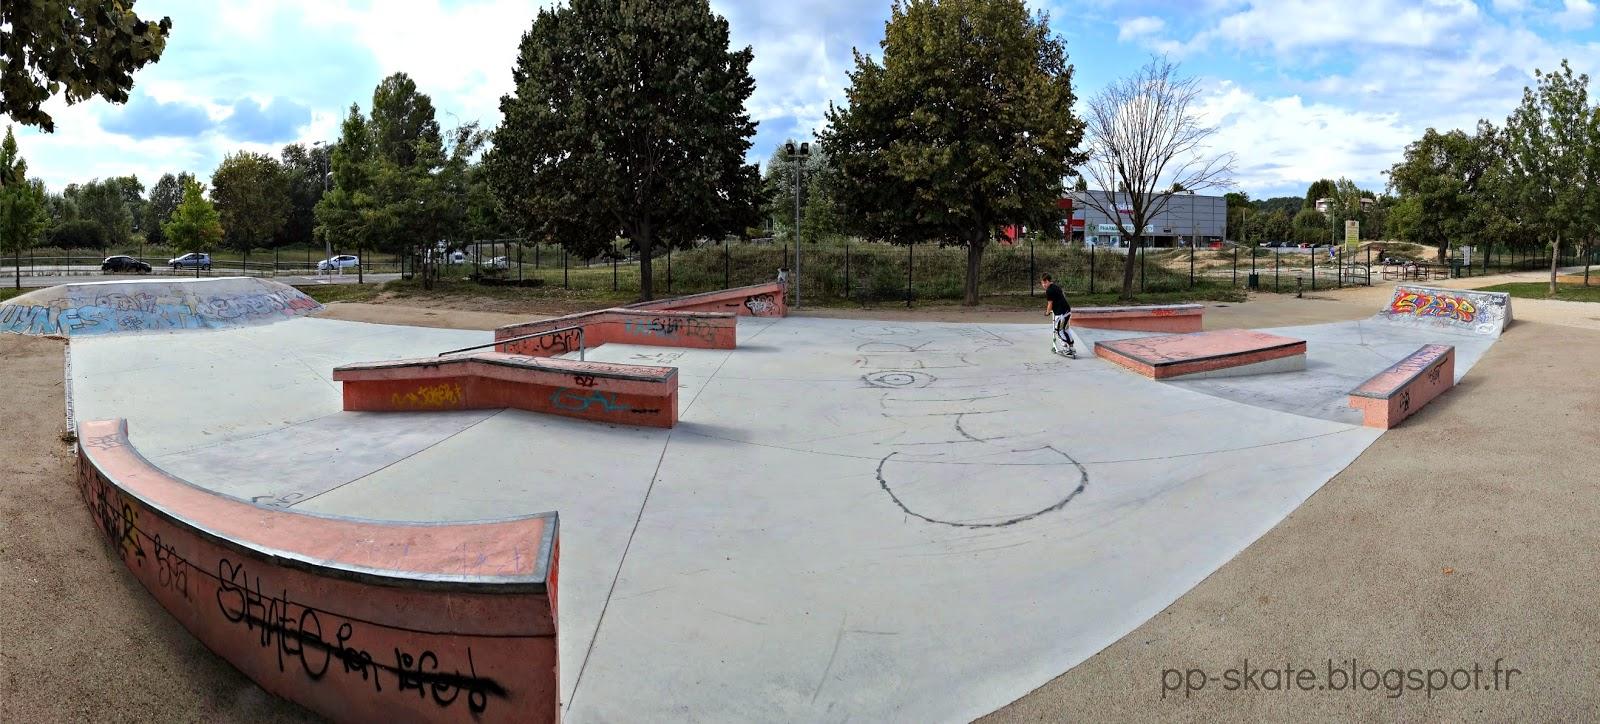 skatepark Luynes